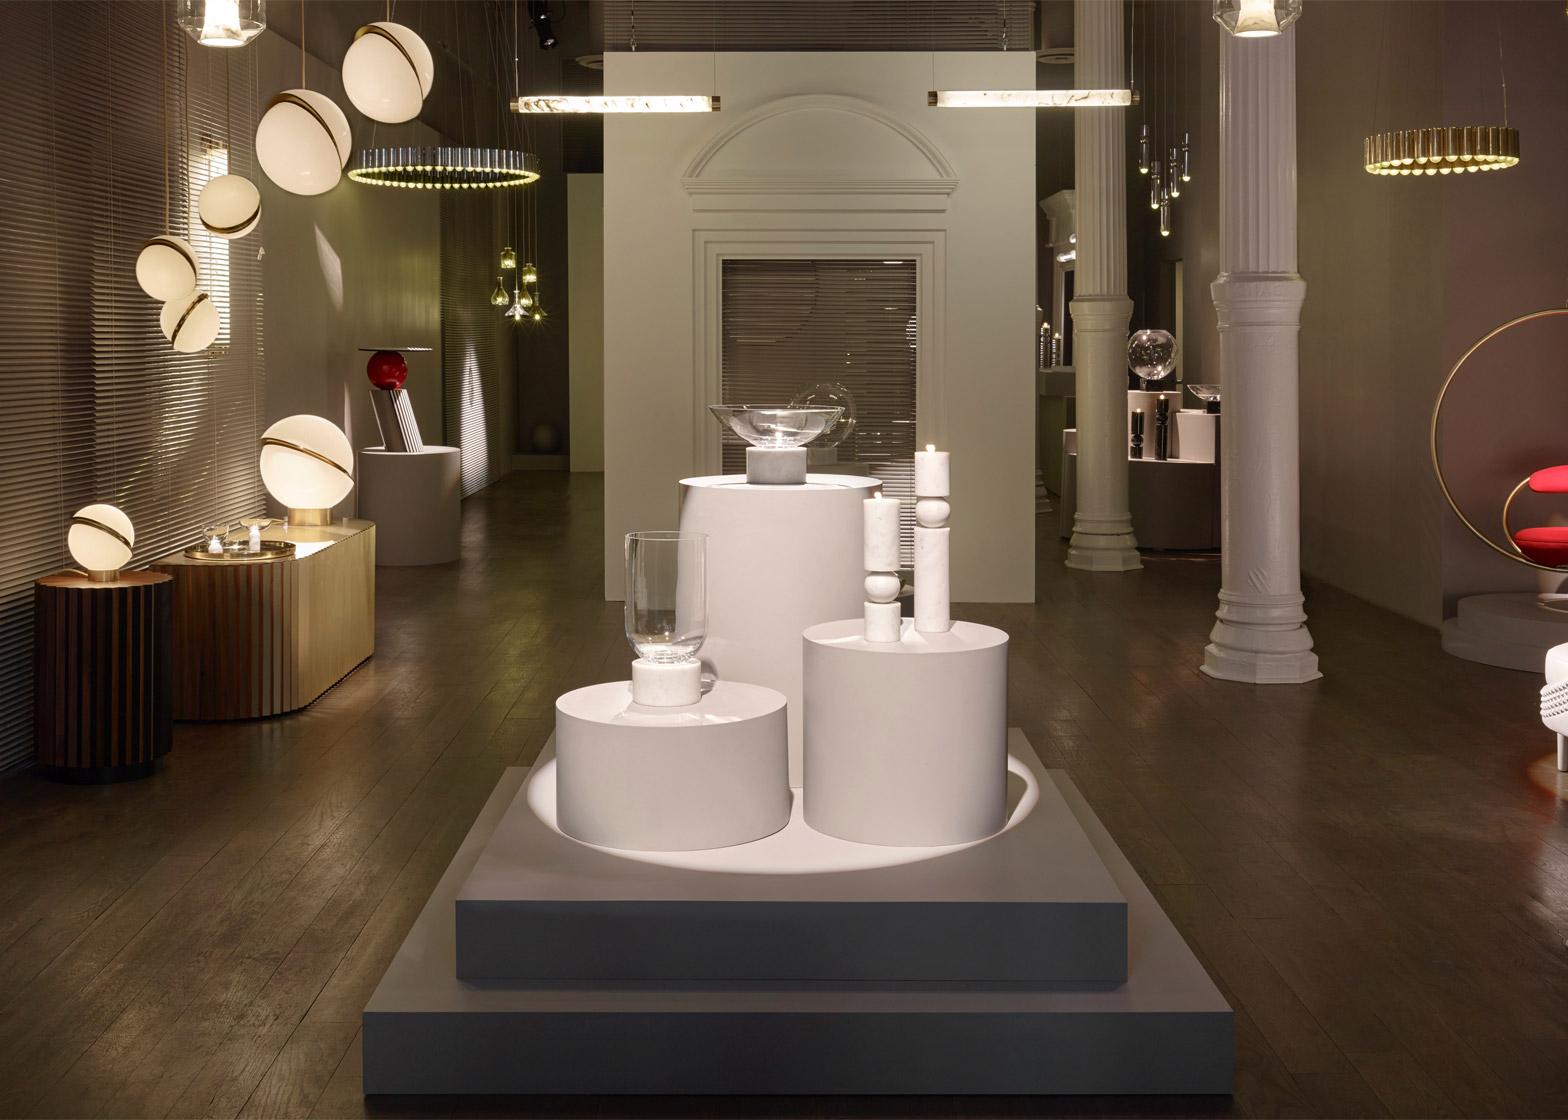 lee-broom-designer-store-interior-soho-new-york-city-usa_dezeen_1568_5.jpg